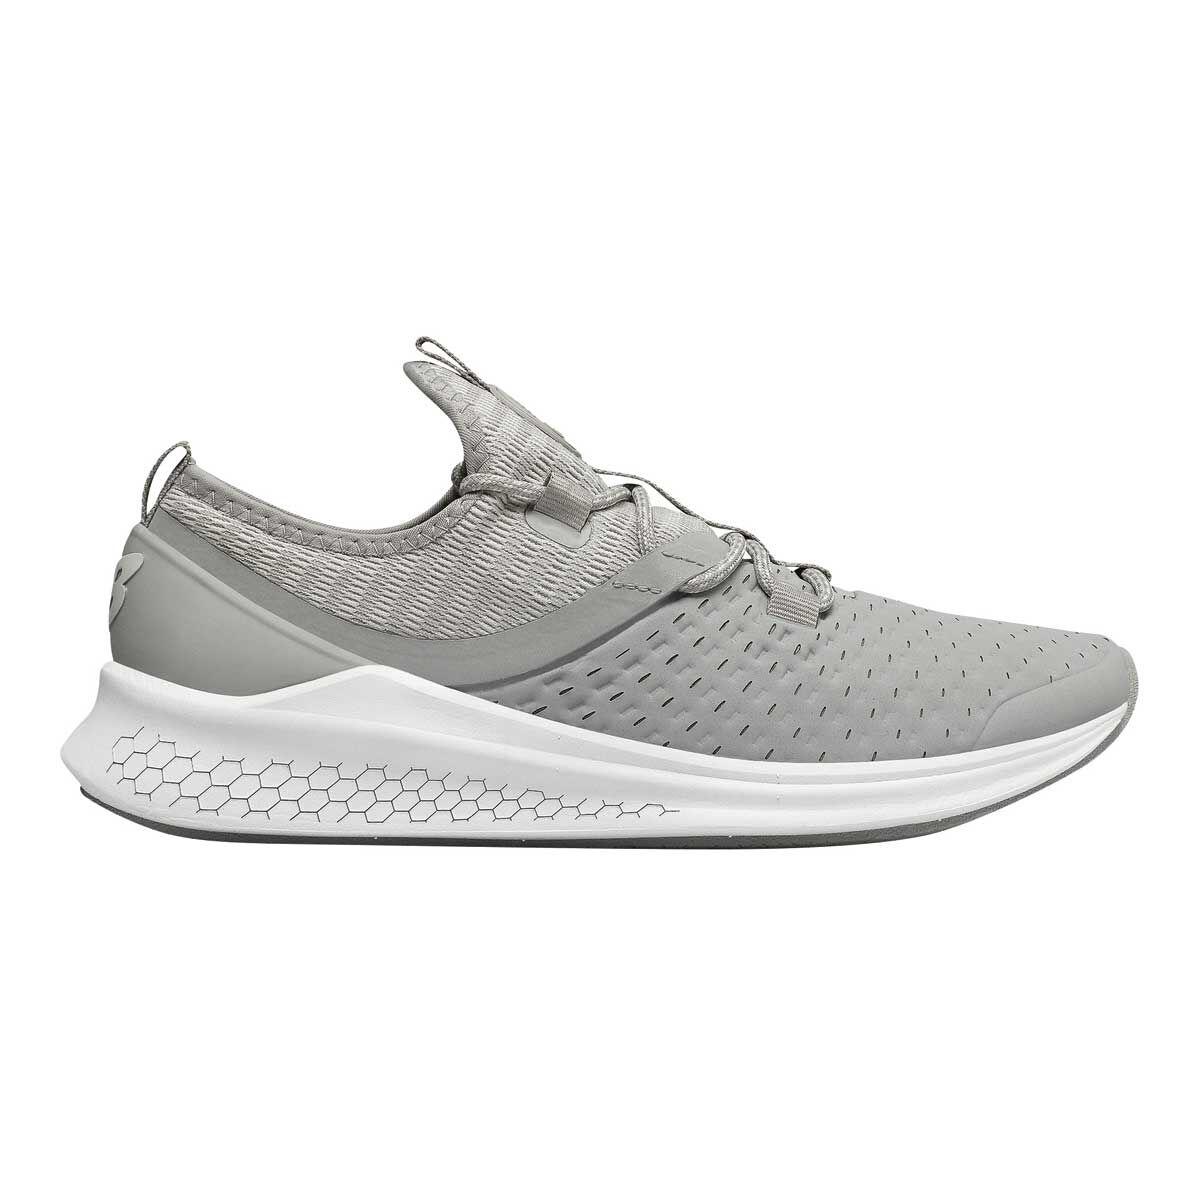 0f34c163499b Rebel Sport Fresh Balance Womens Hyposkin Foam New Lazr Shoes Running  8z1nppxF